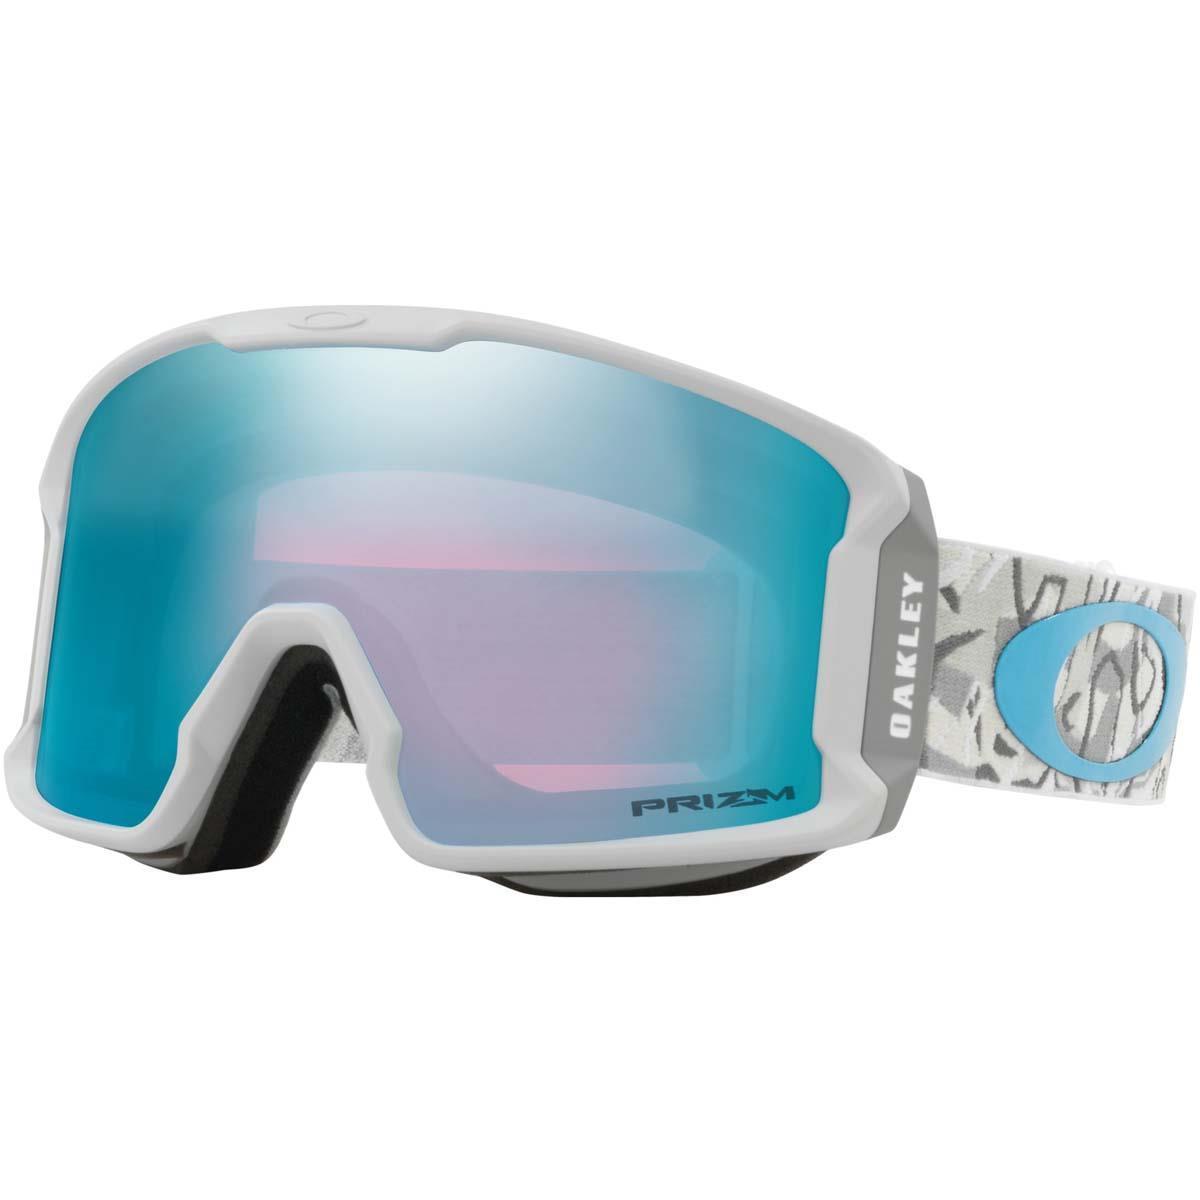 c16946de0606 Oakley Prizm Line Miner XM Goggle. Loading zoom